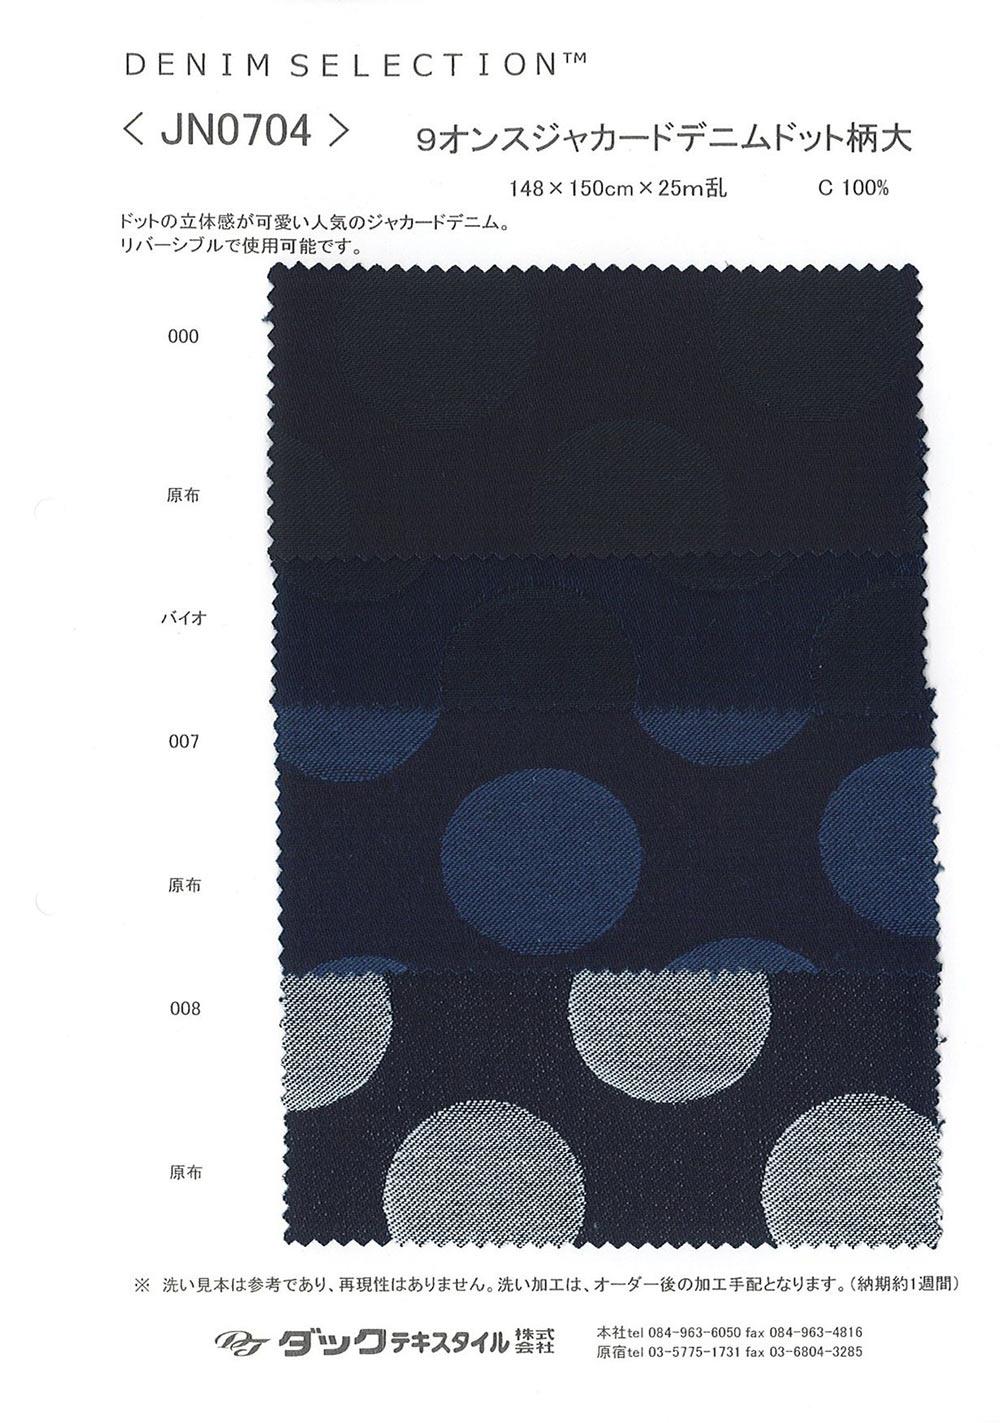 JN0704 9オンスジャカードデニムドット柄大[生地] ダックテキスタイル/オークラ商事 - ApparelX アパレル資材卸通販